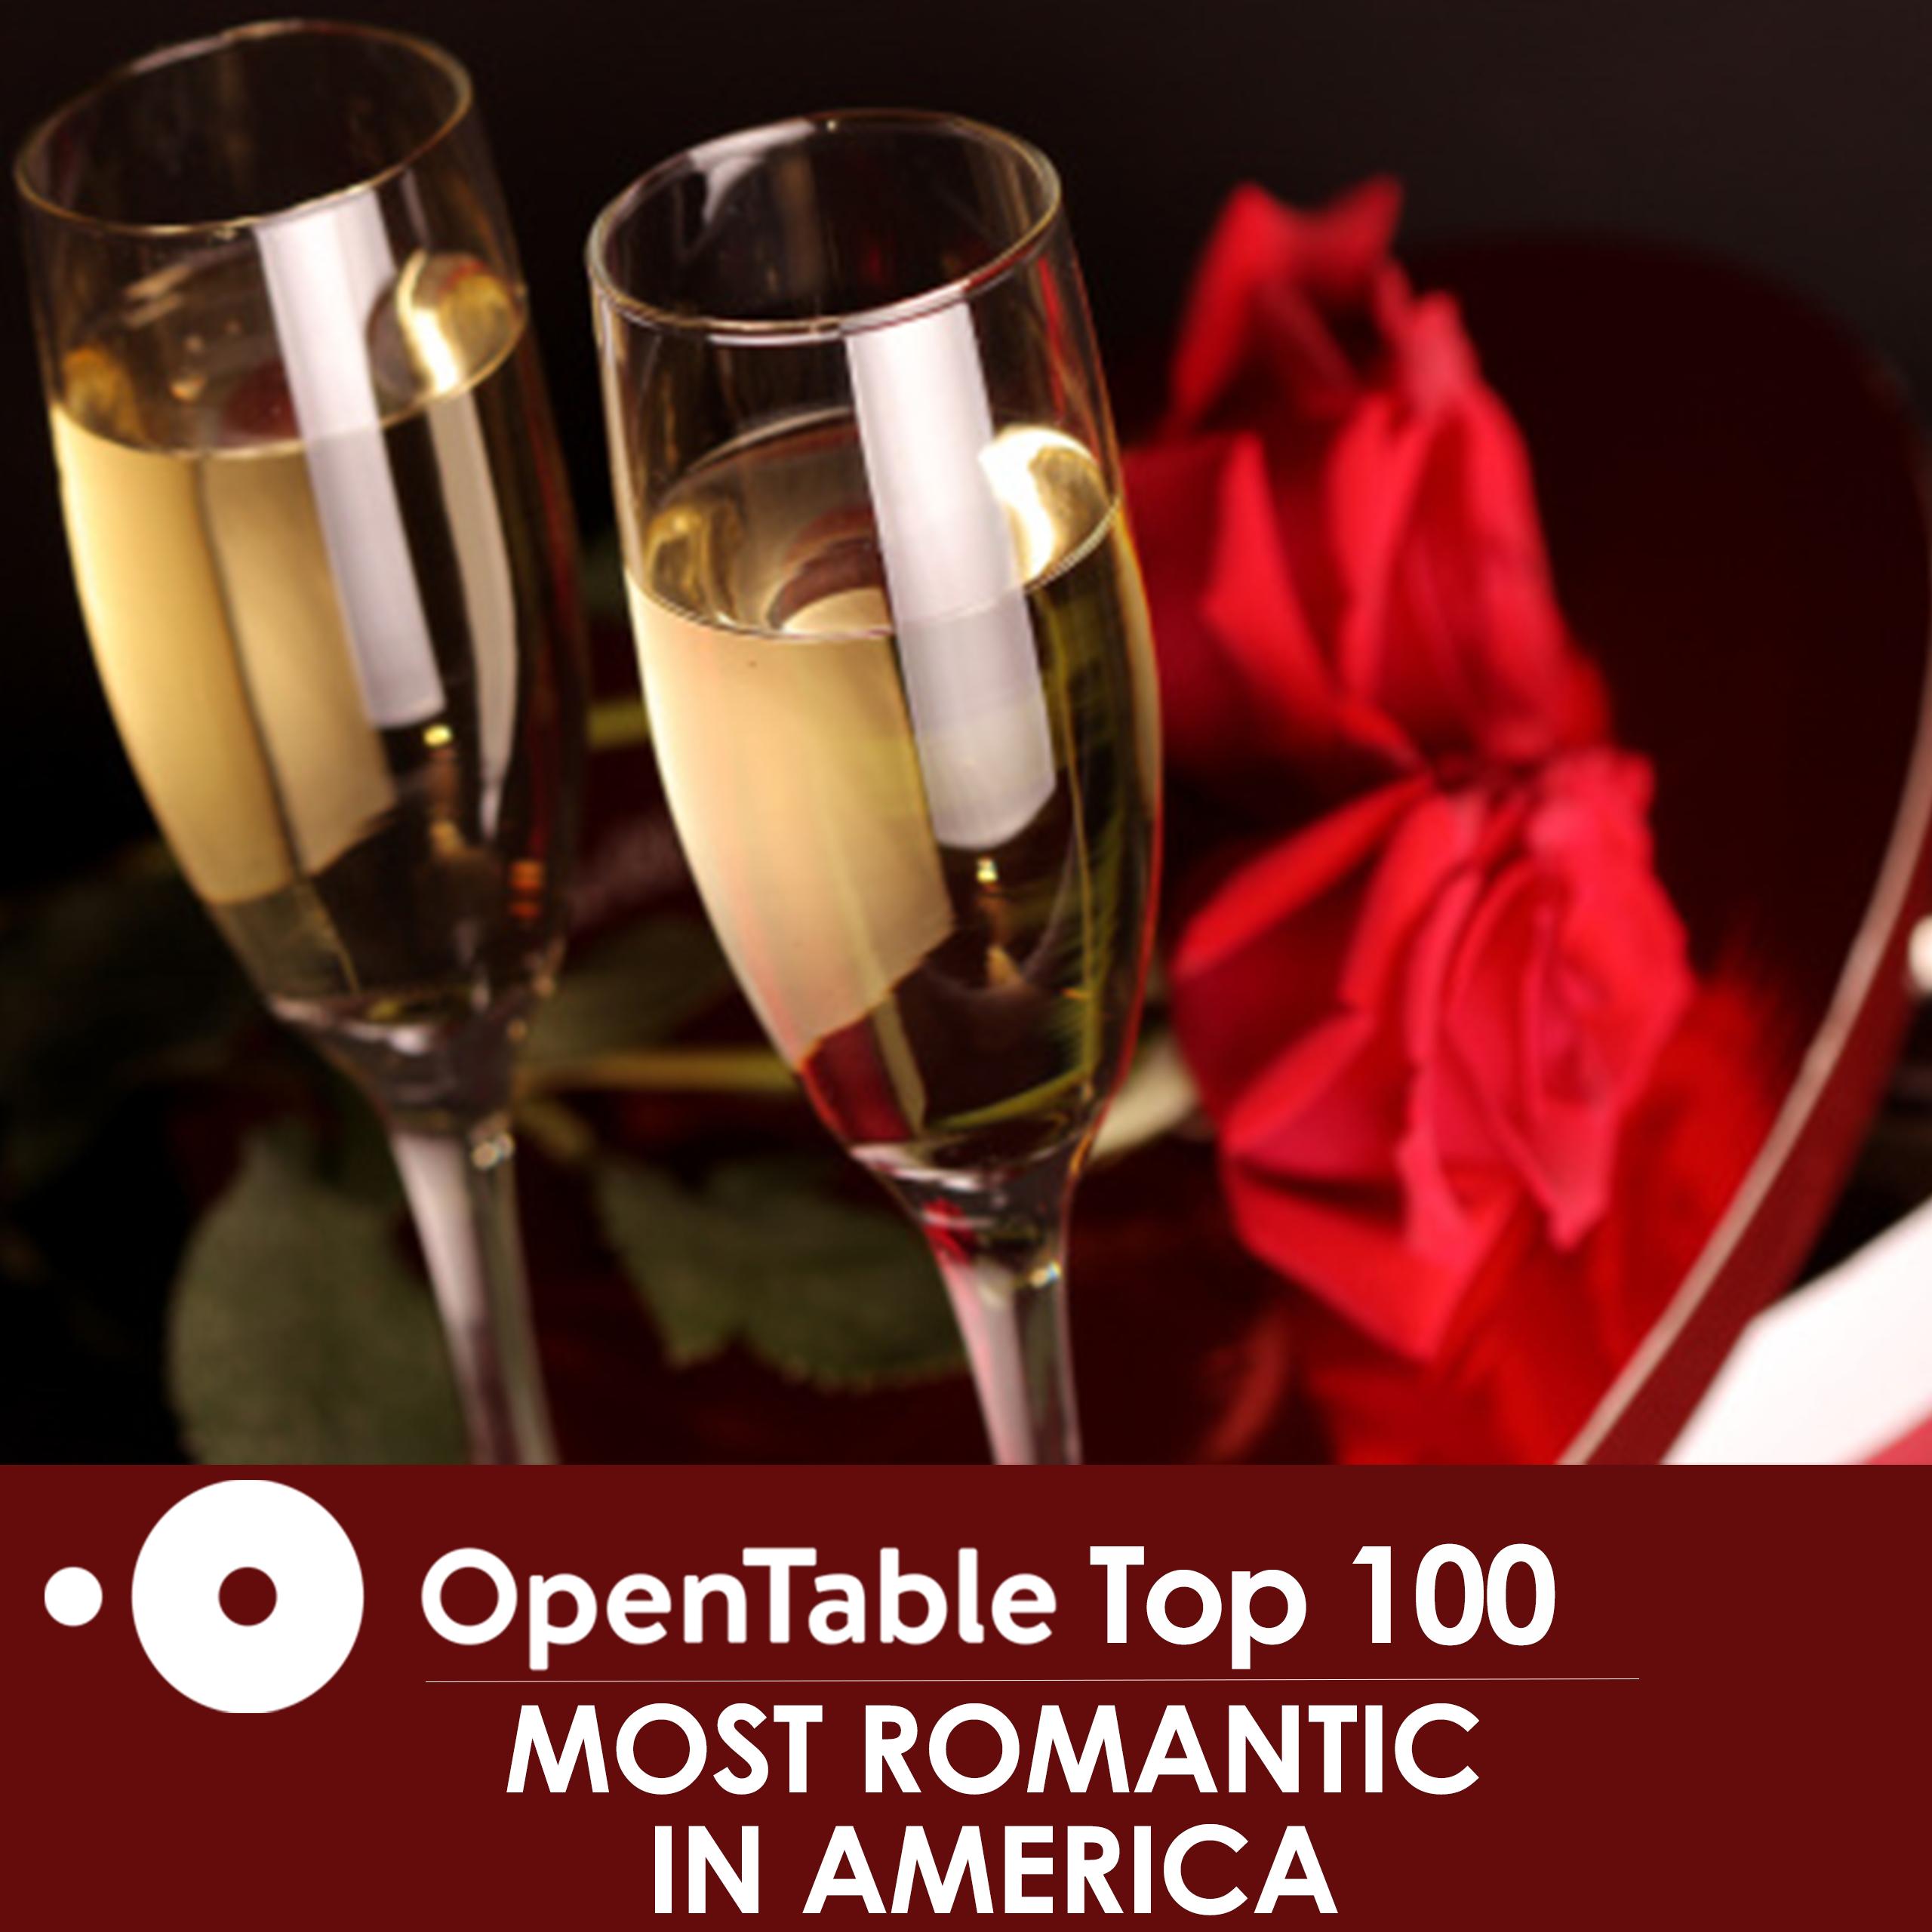 OpenTable Most Romantic